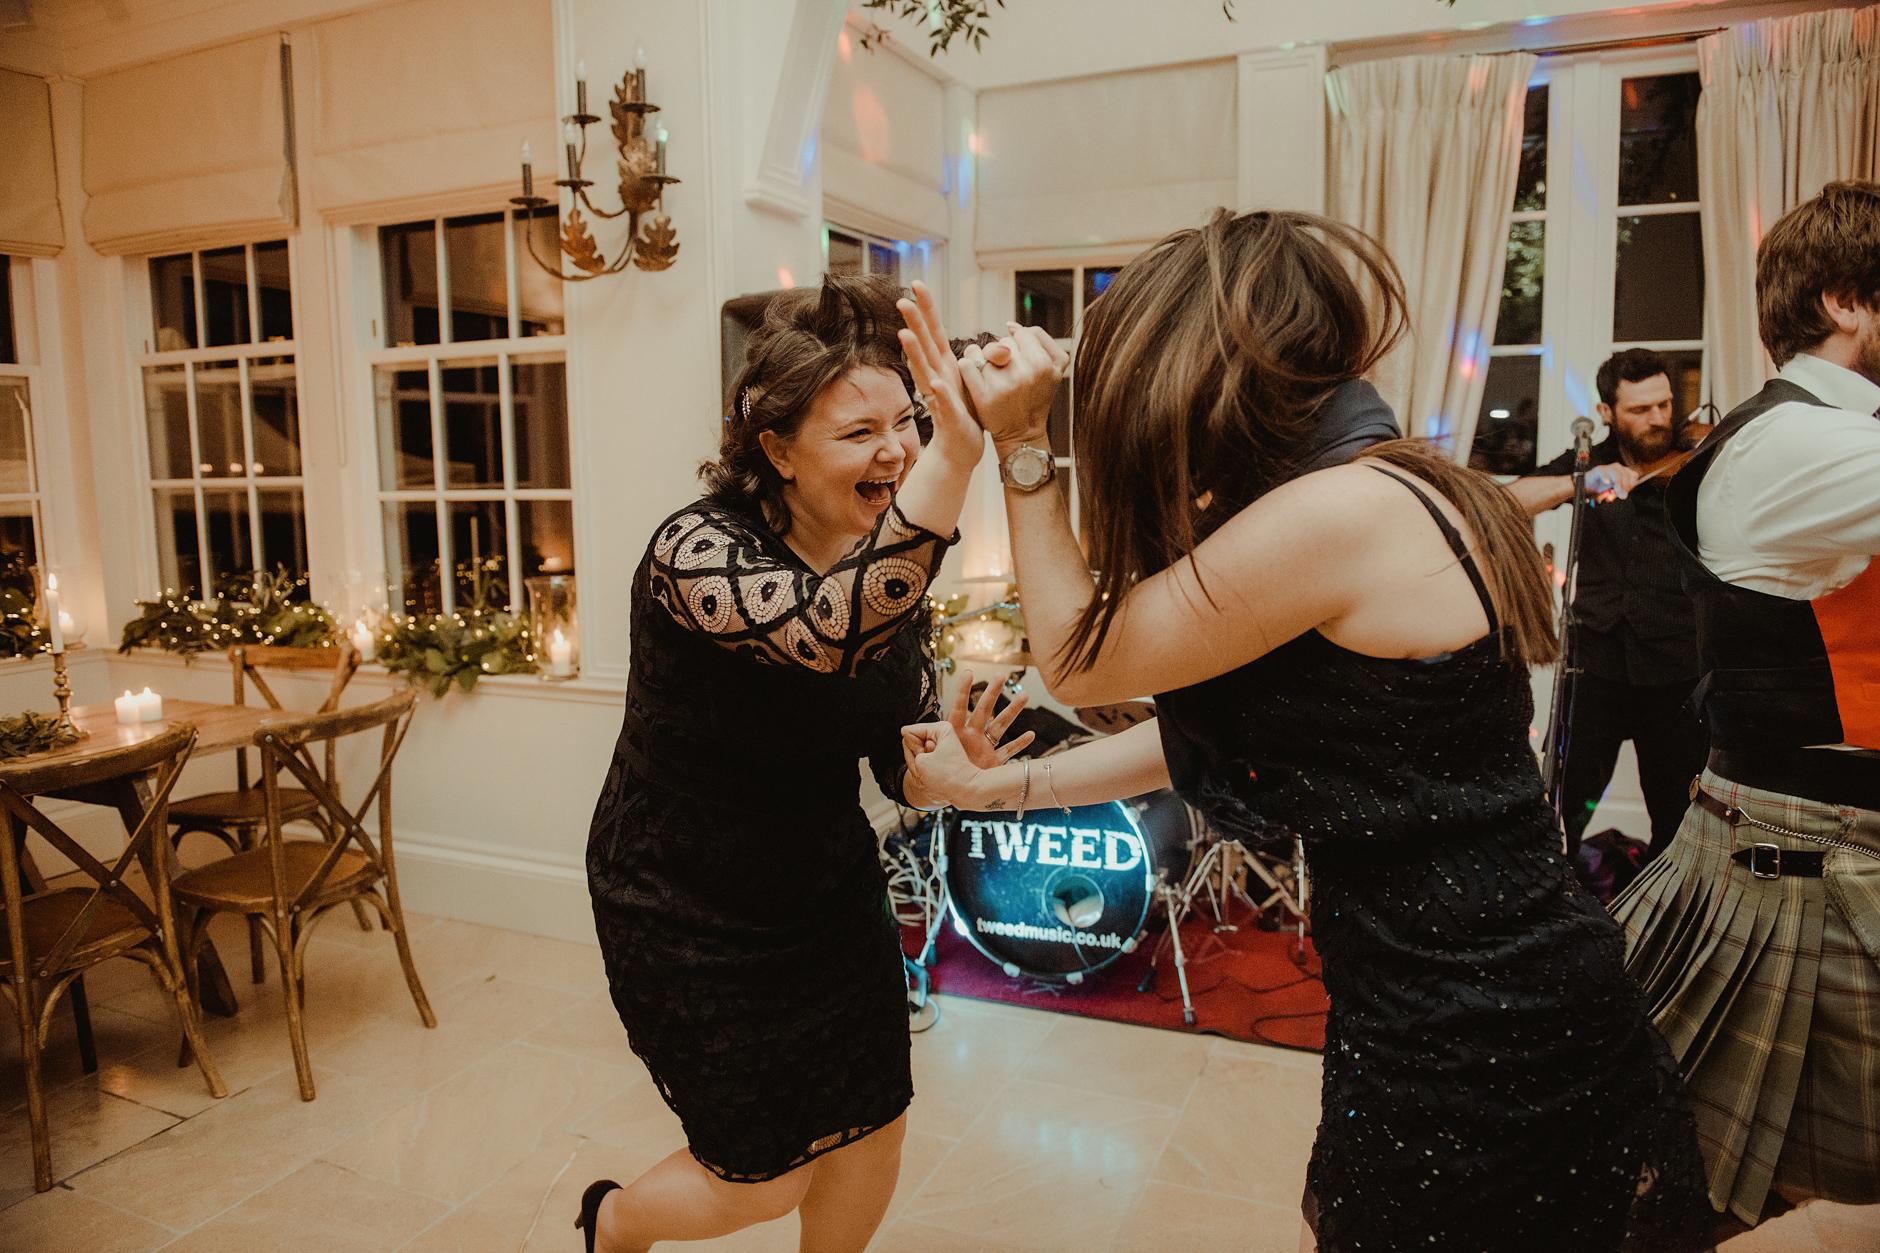 Glentruim-Wedding-Nikki-Leadbetter-Photography-345.jpg